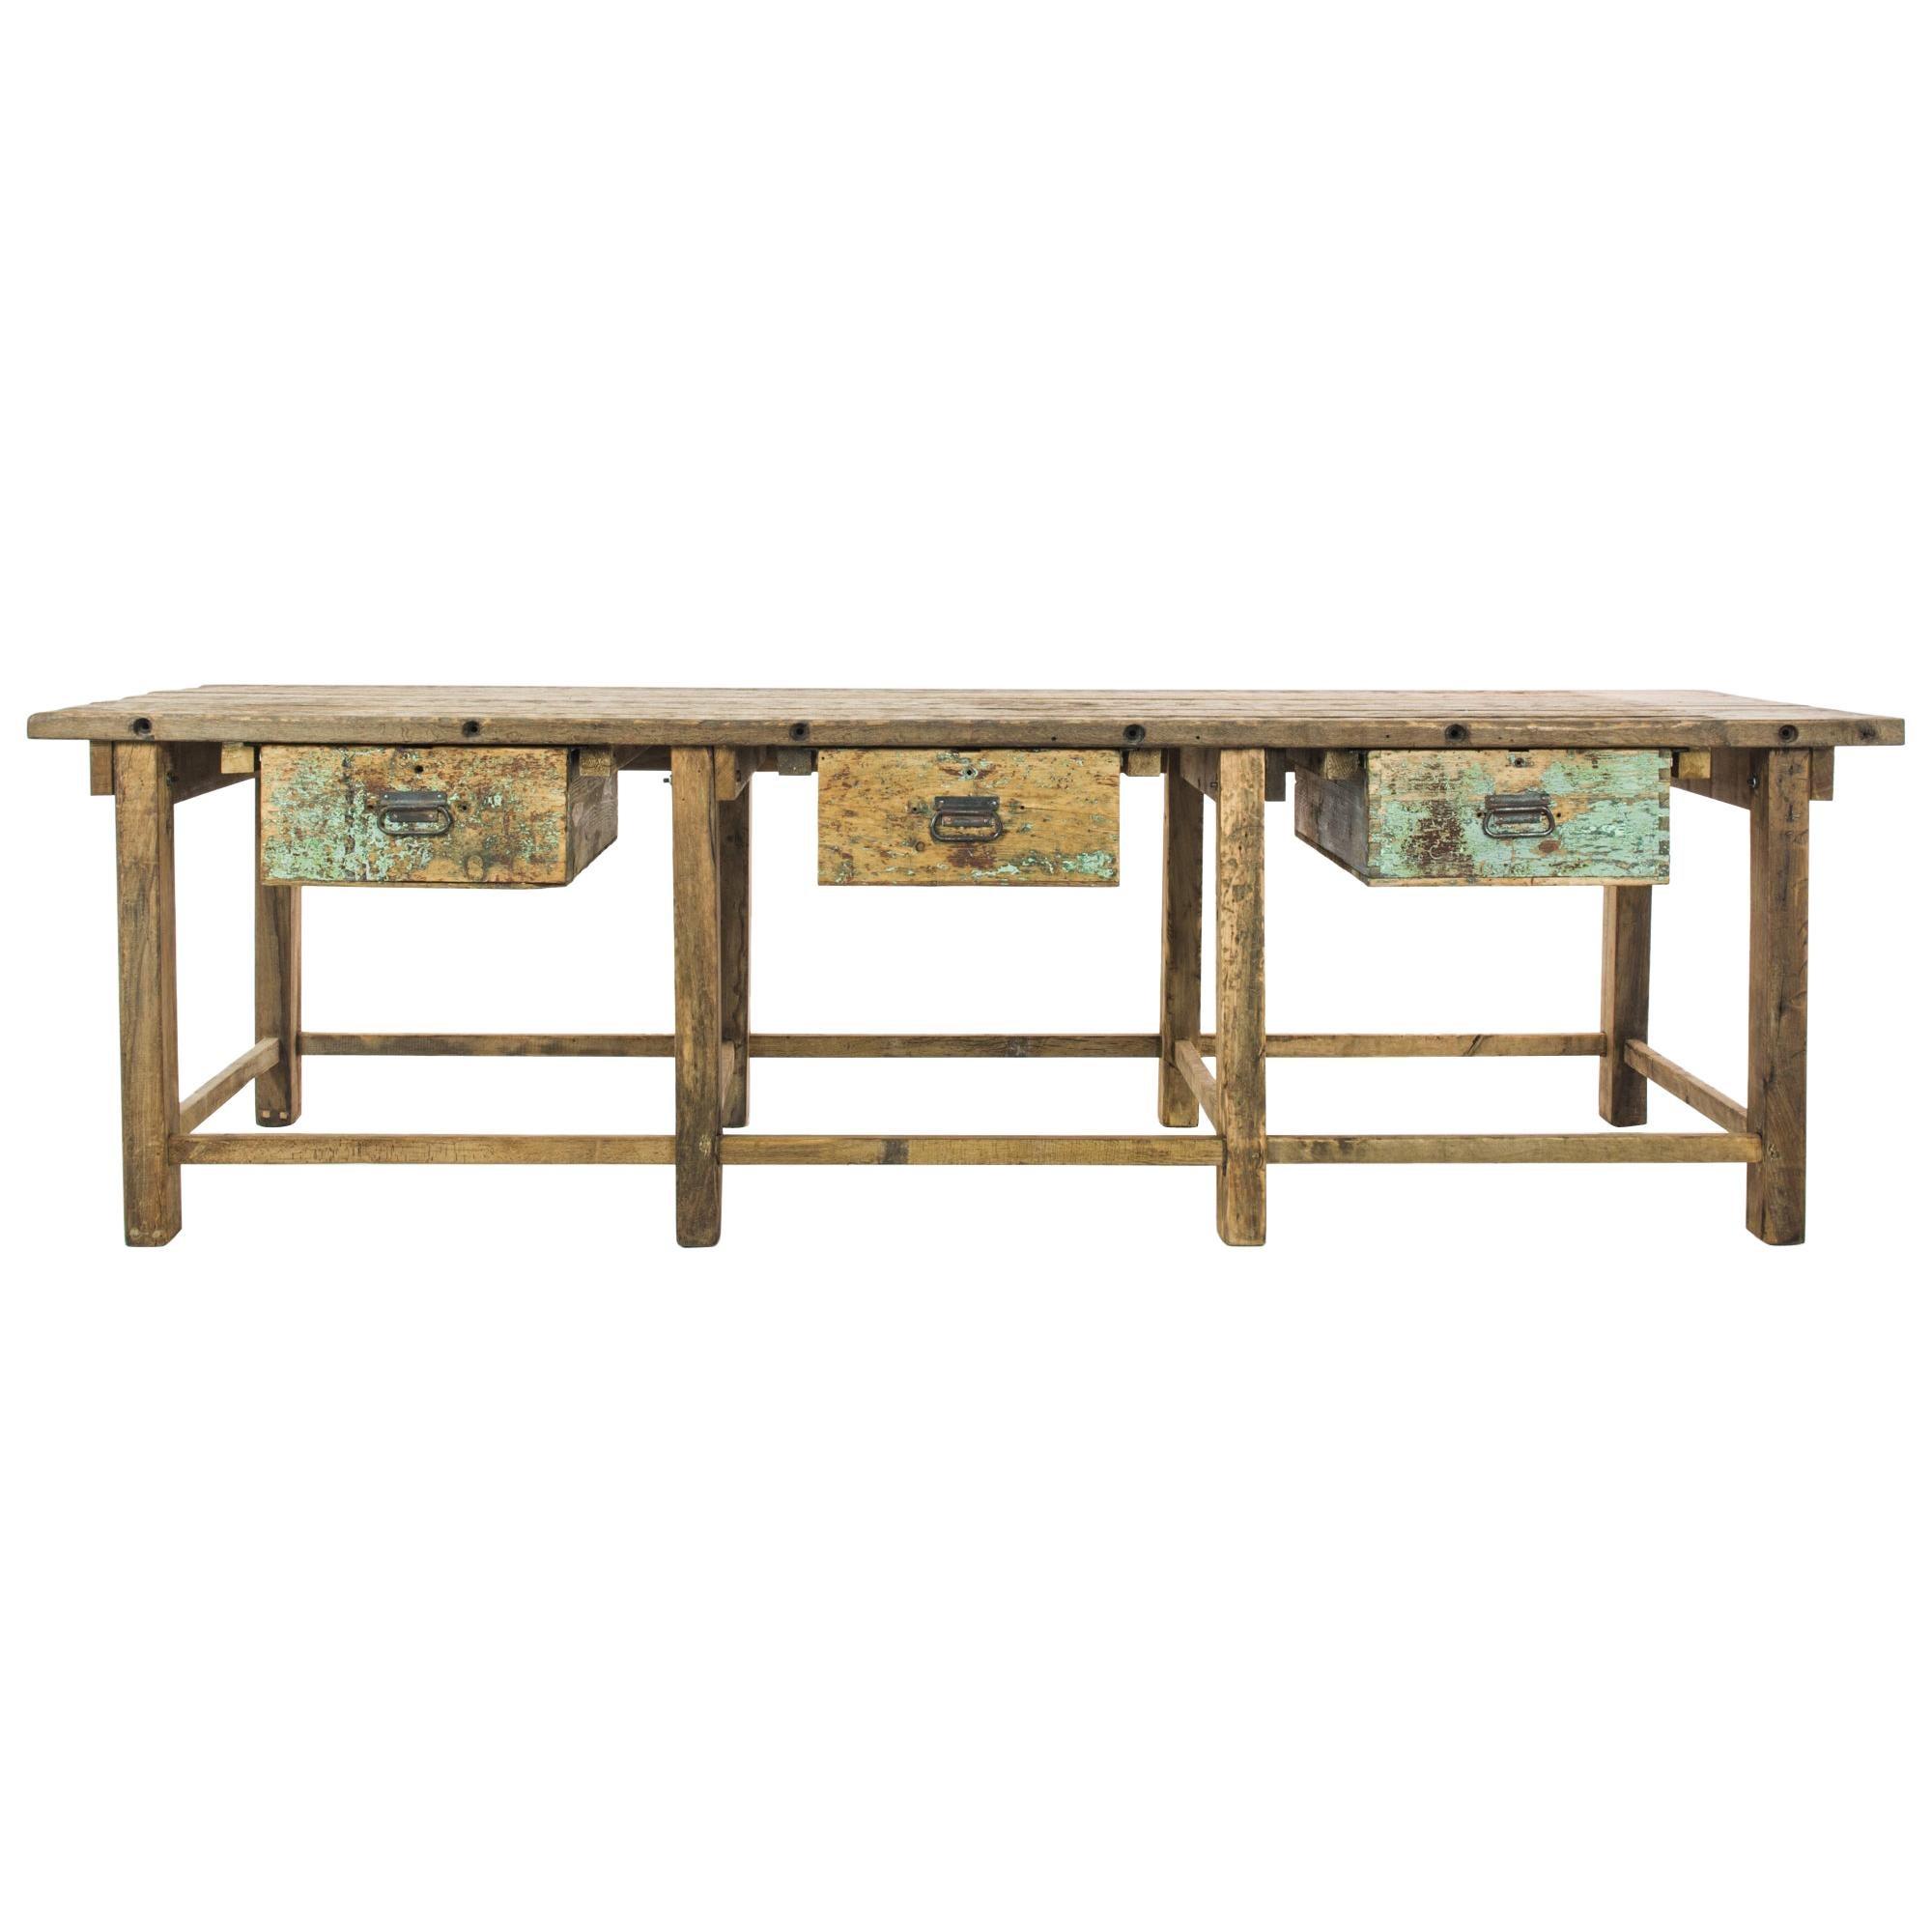 1950s Czech Industrial Wooden Work Table